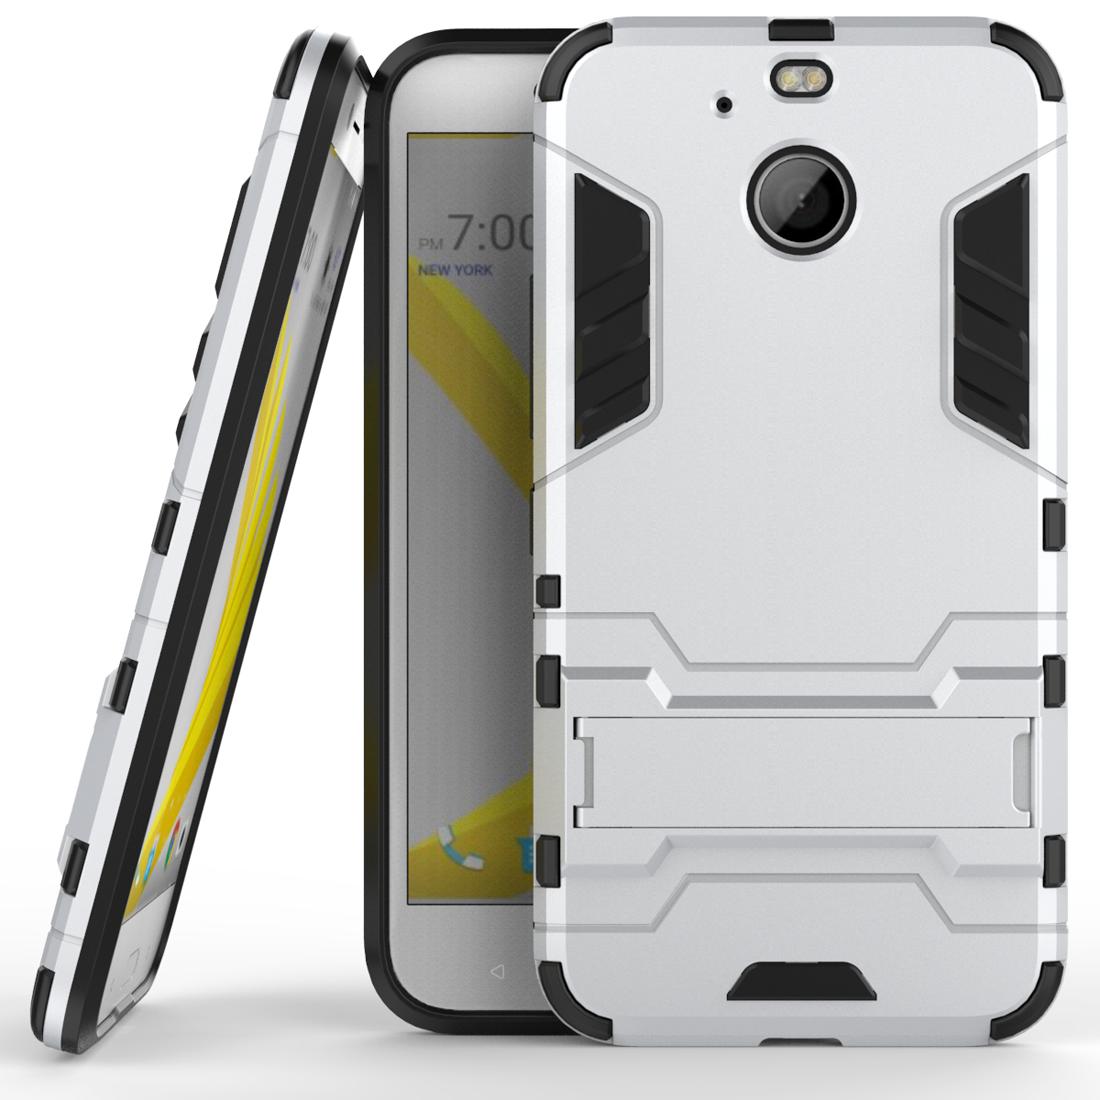 new arrivals e401c d513e Tough Armor Kickstand Combo Protective Cover Cases For HTC Bolt / HTC 10  EVO - Silver